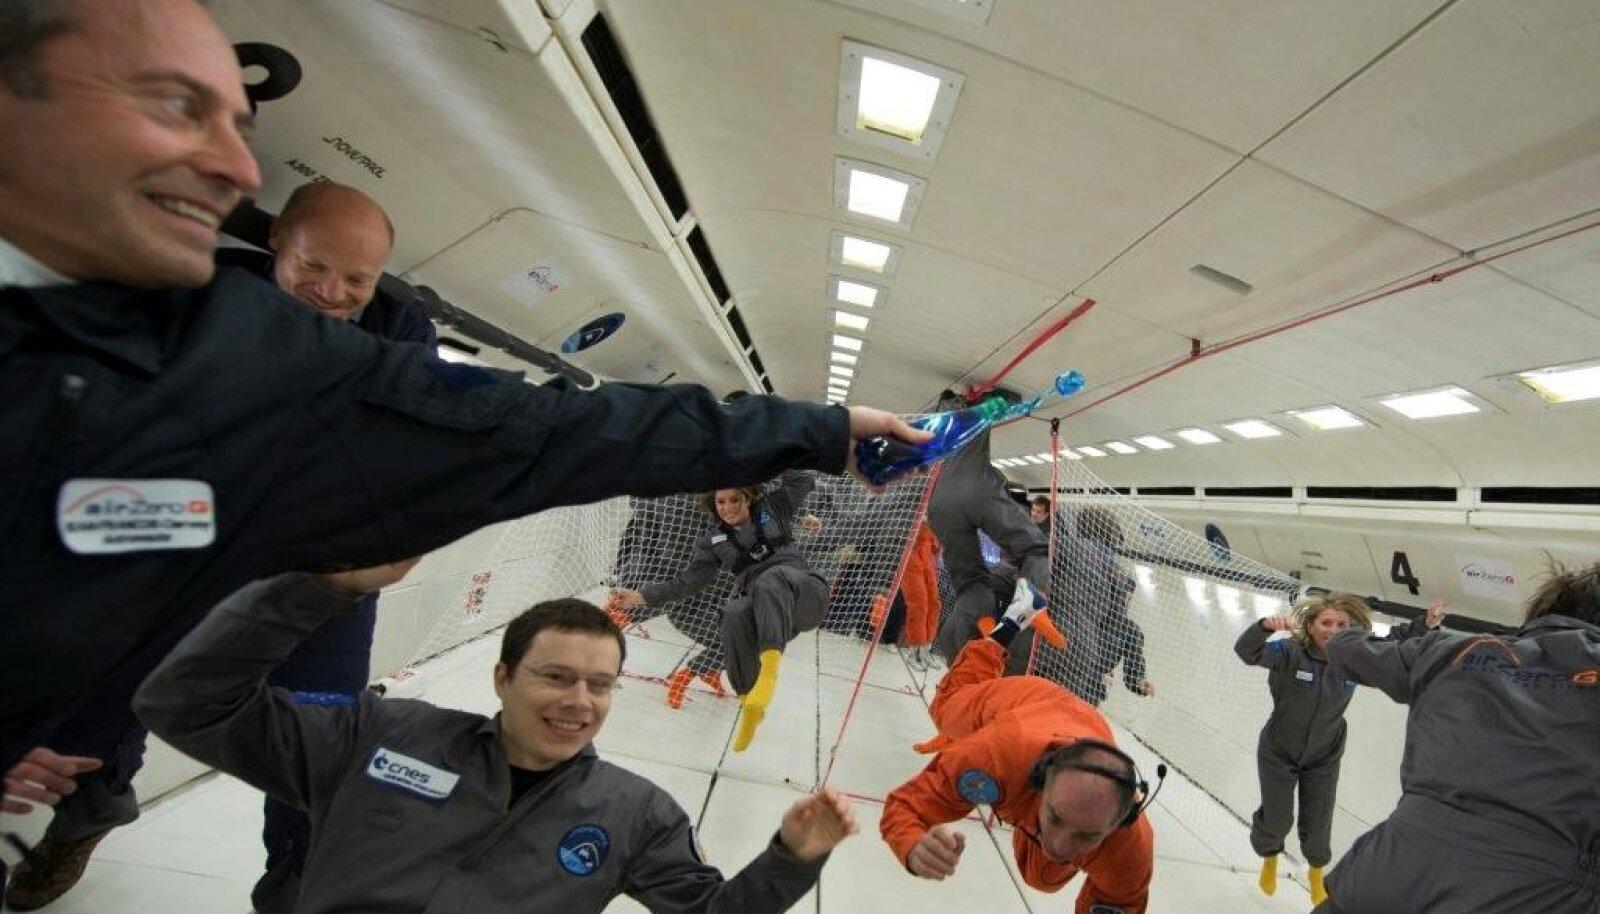 Zero G lend kaaluta olekus. https://www.airzerog.com/en/fly-weightless